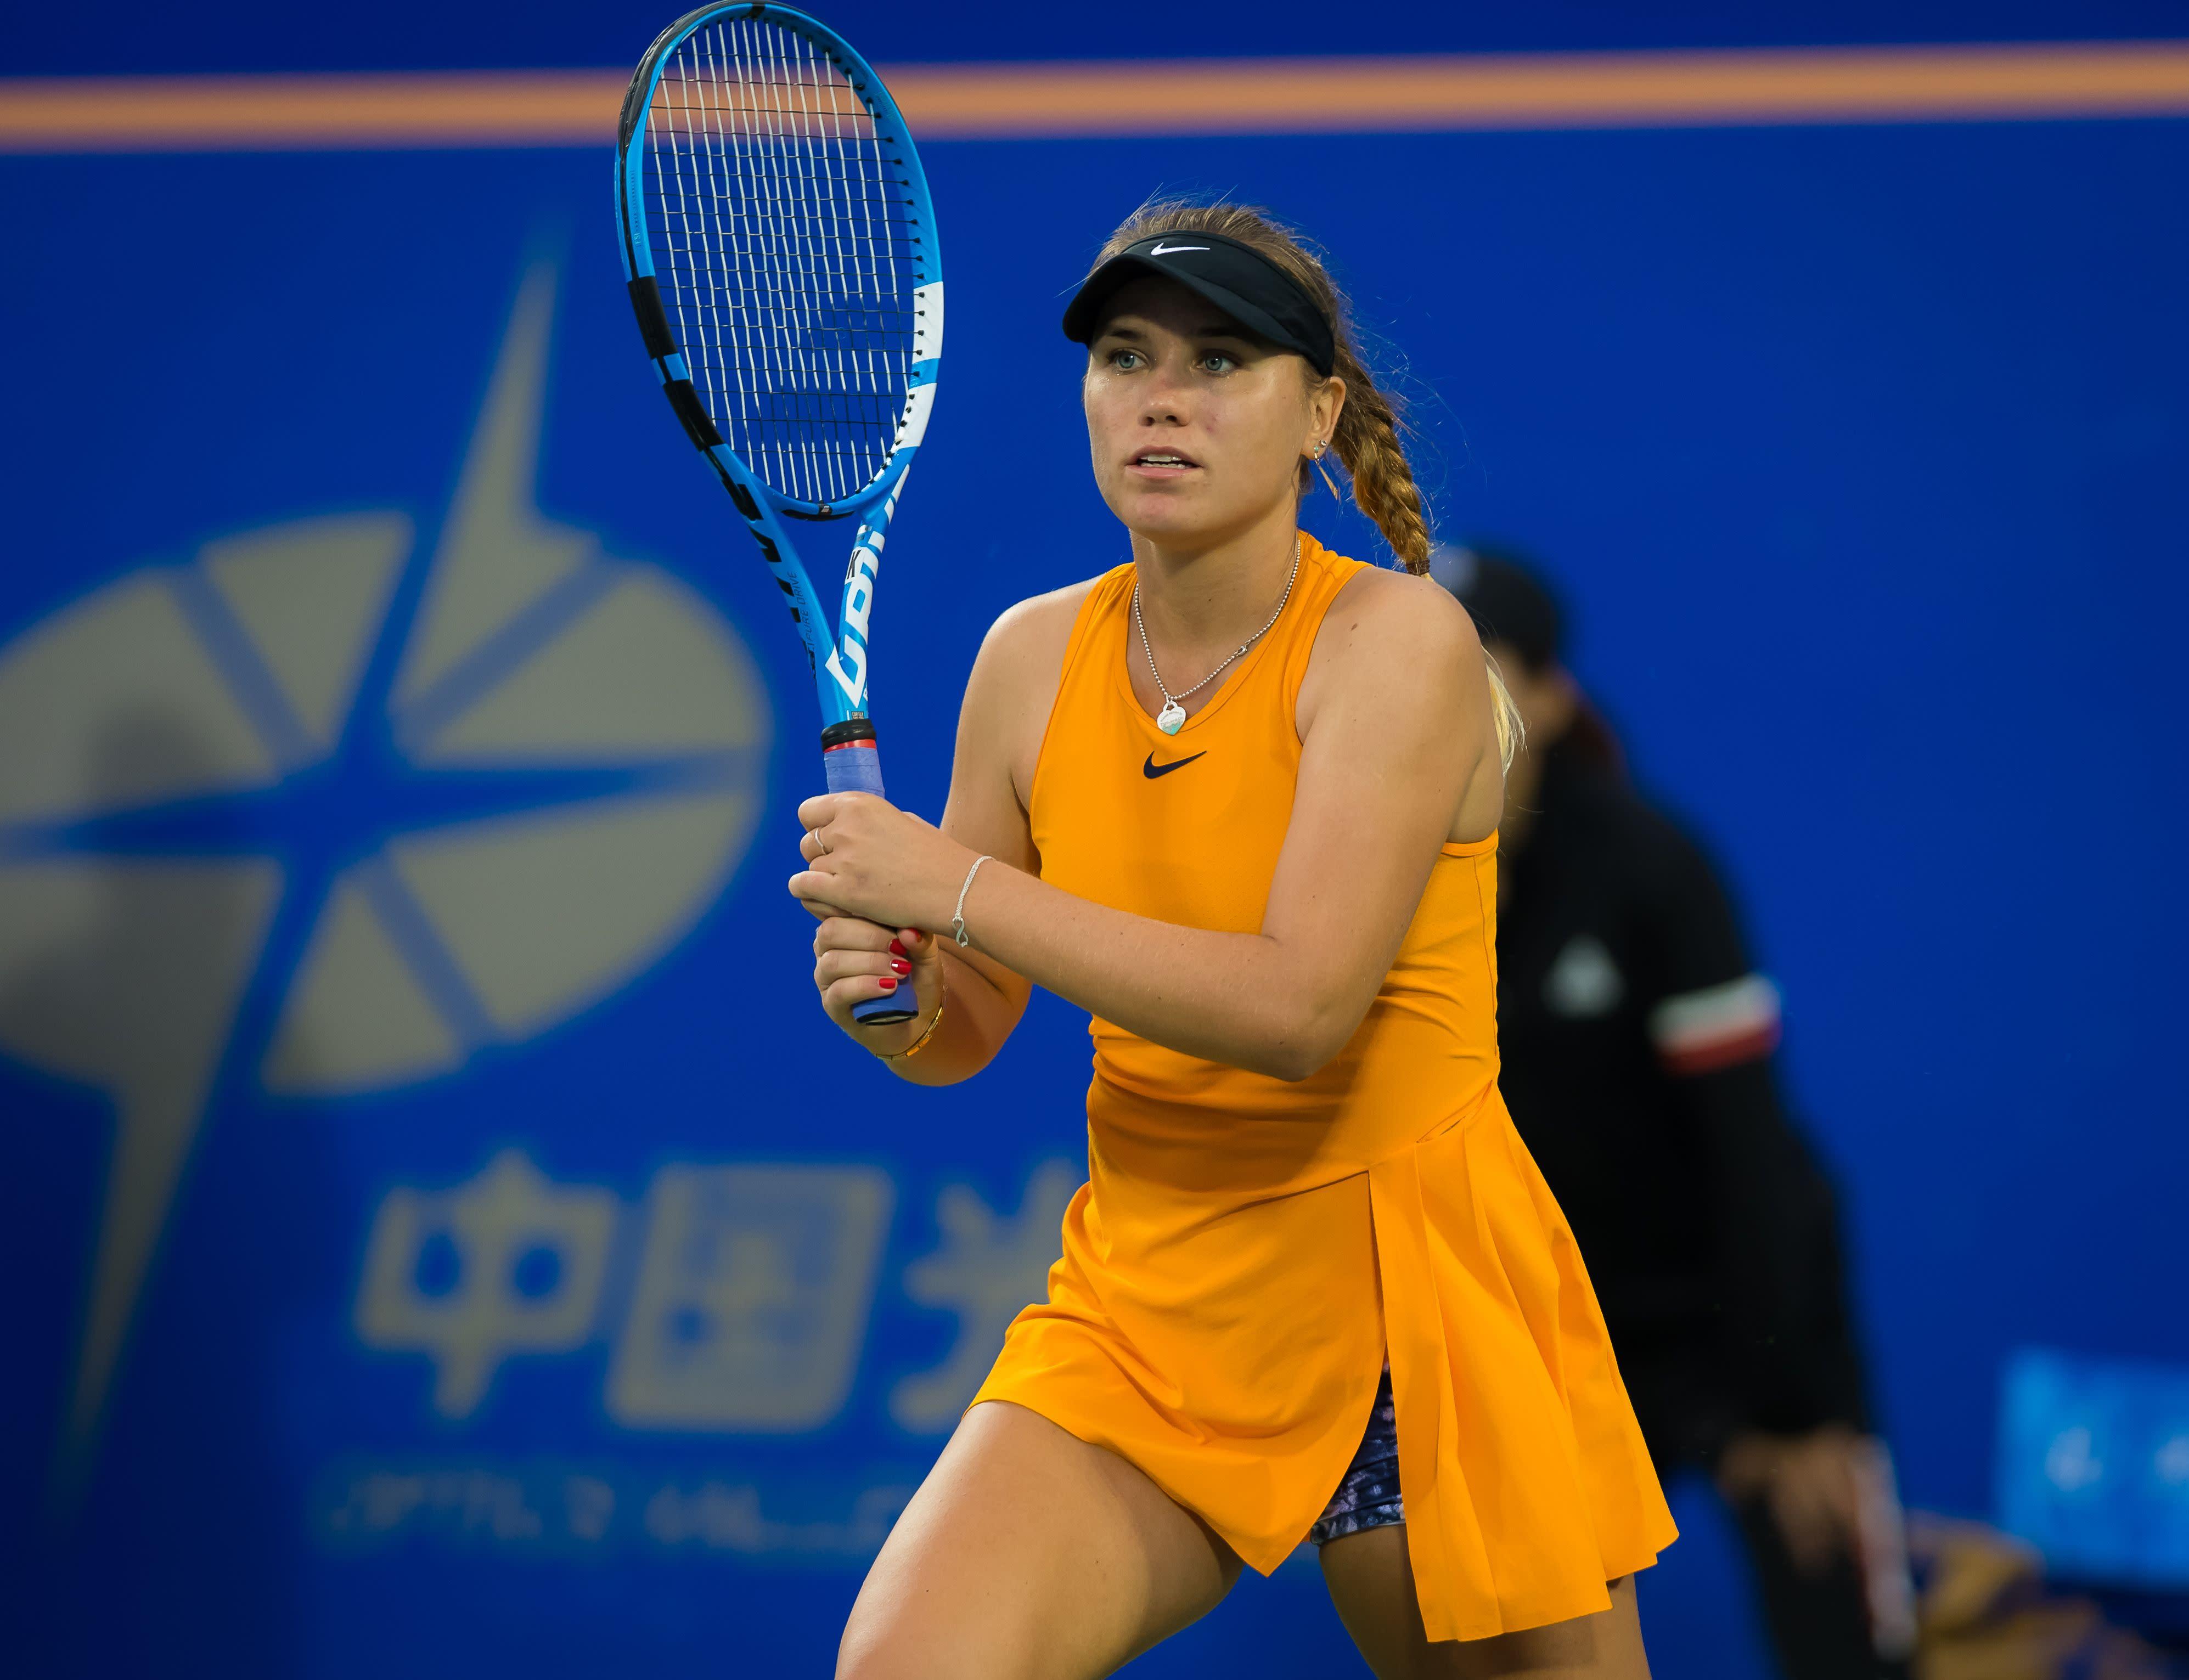 Fila Signs Sponsorship Agreement With WTA Rising Star Sofia